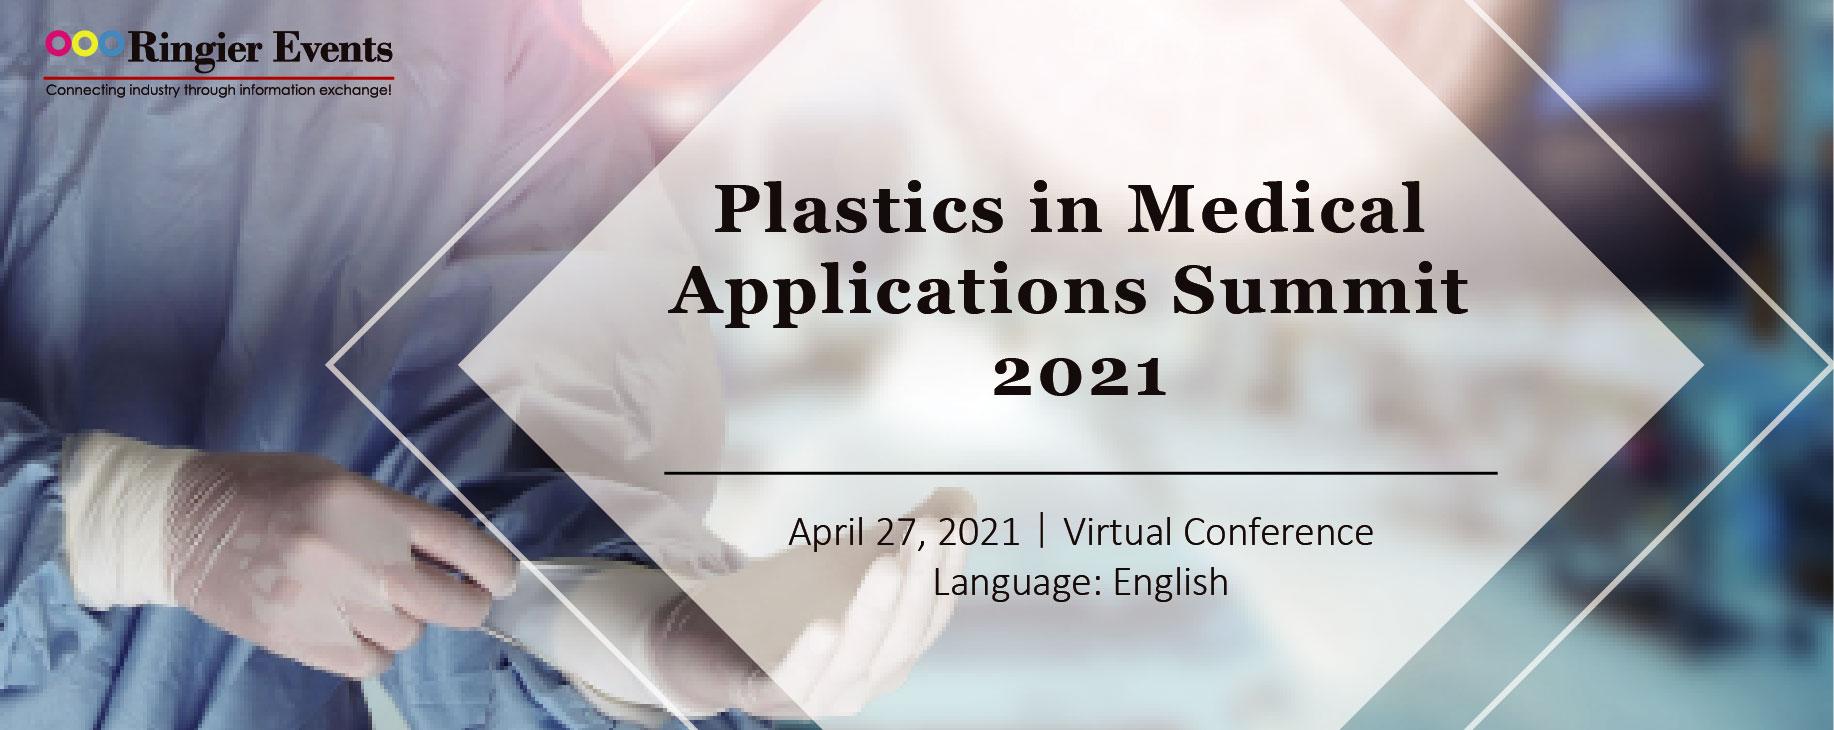 Plastics in Medical Applications Summit 2021